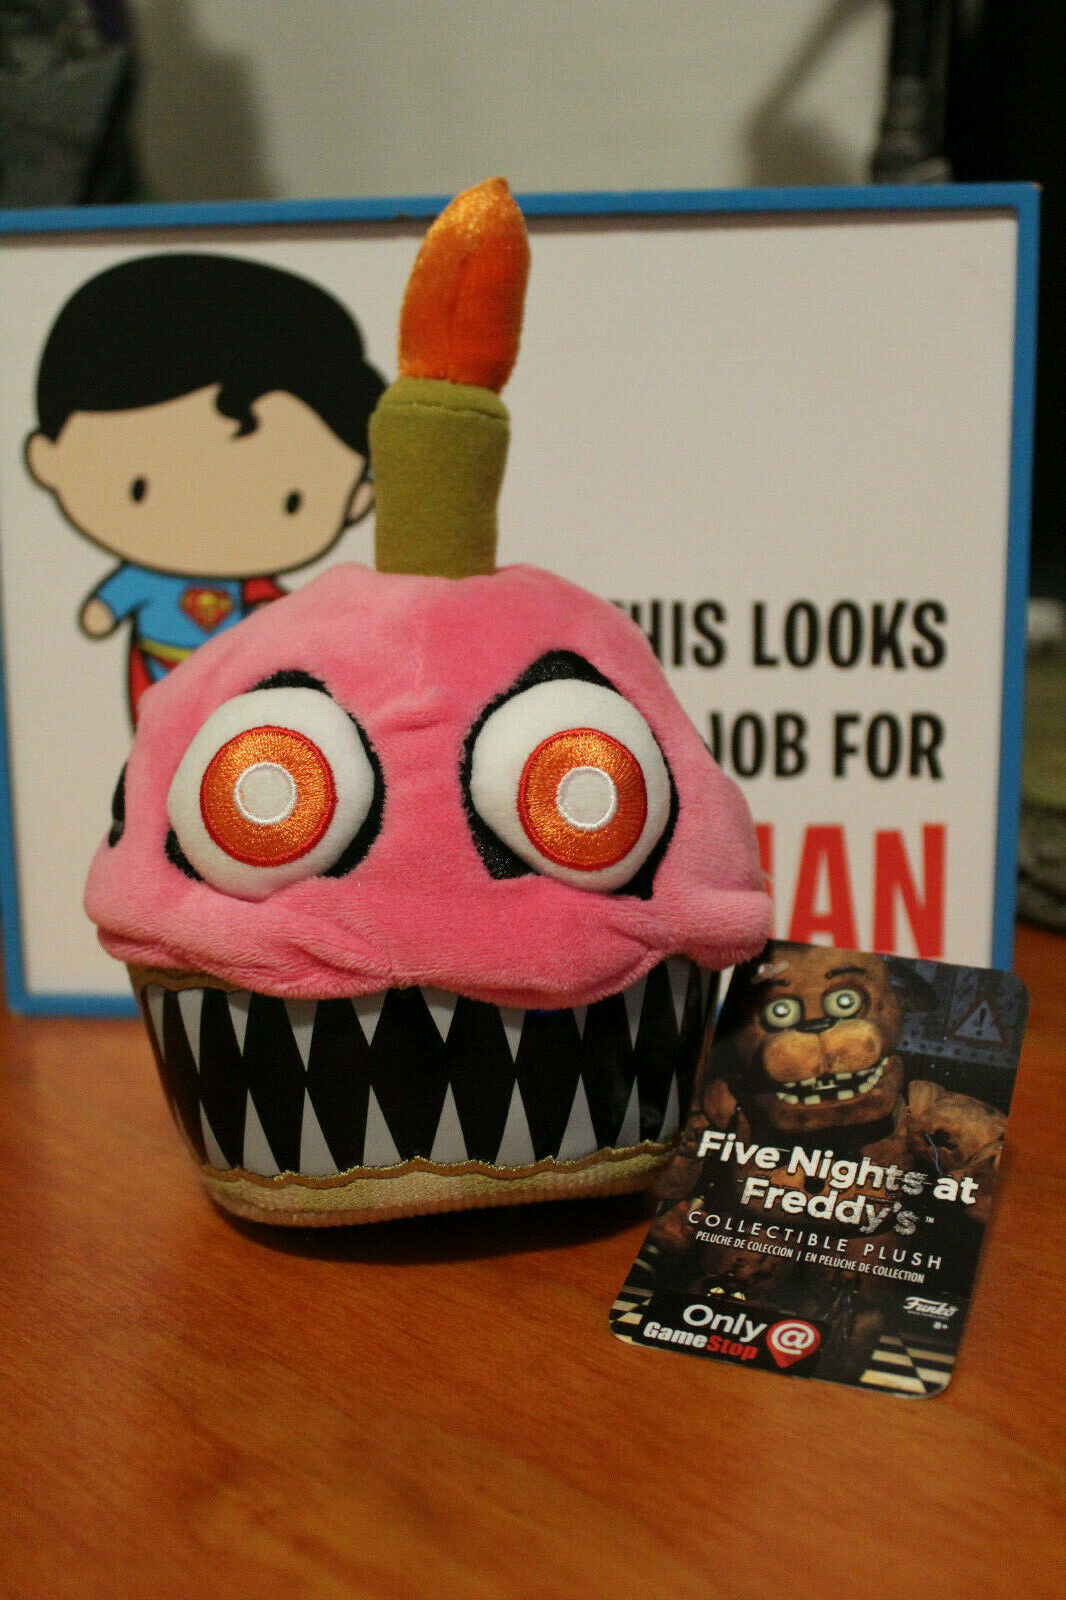 Funko Five Nights At Freddy's Freddy's Freddy's Nightmare Cupcake Gamestop Exclusive Plush f8b47f